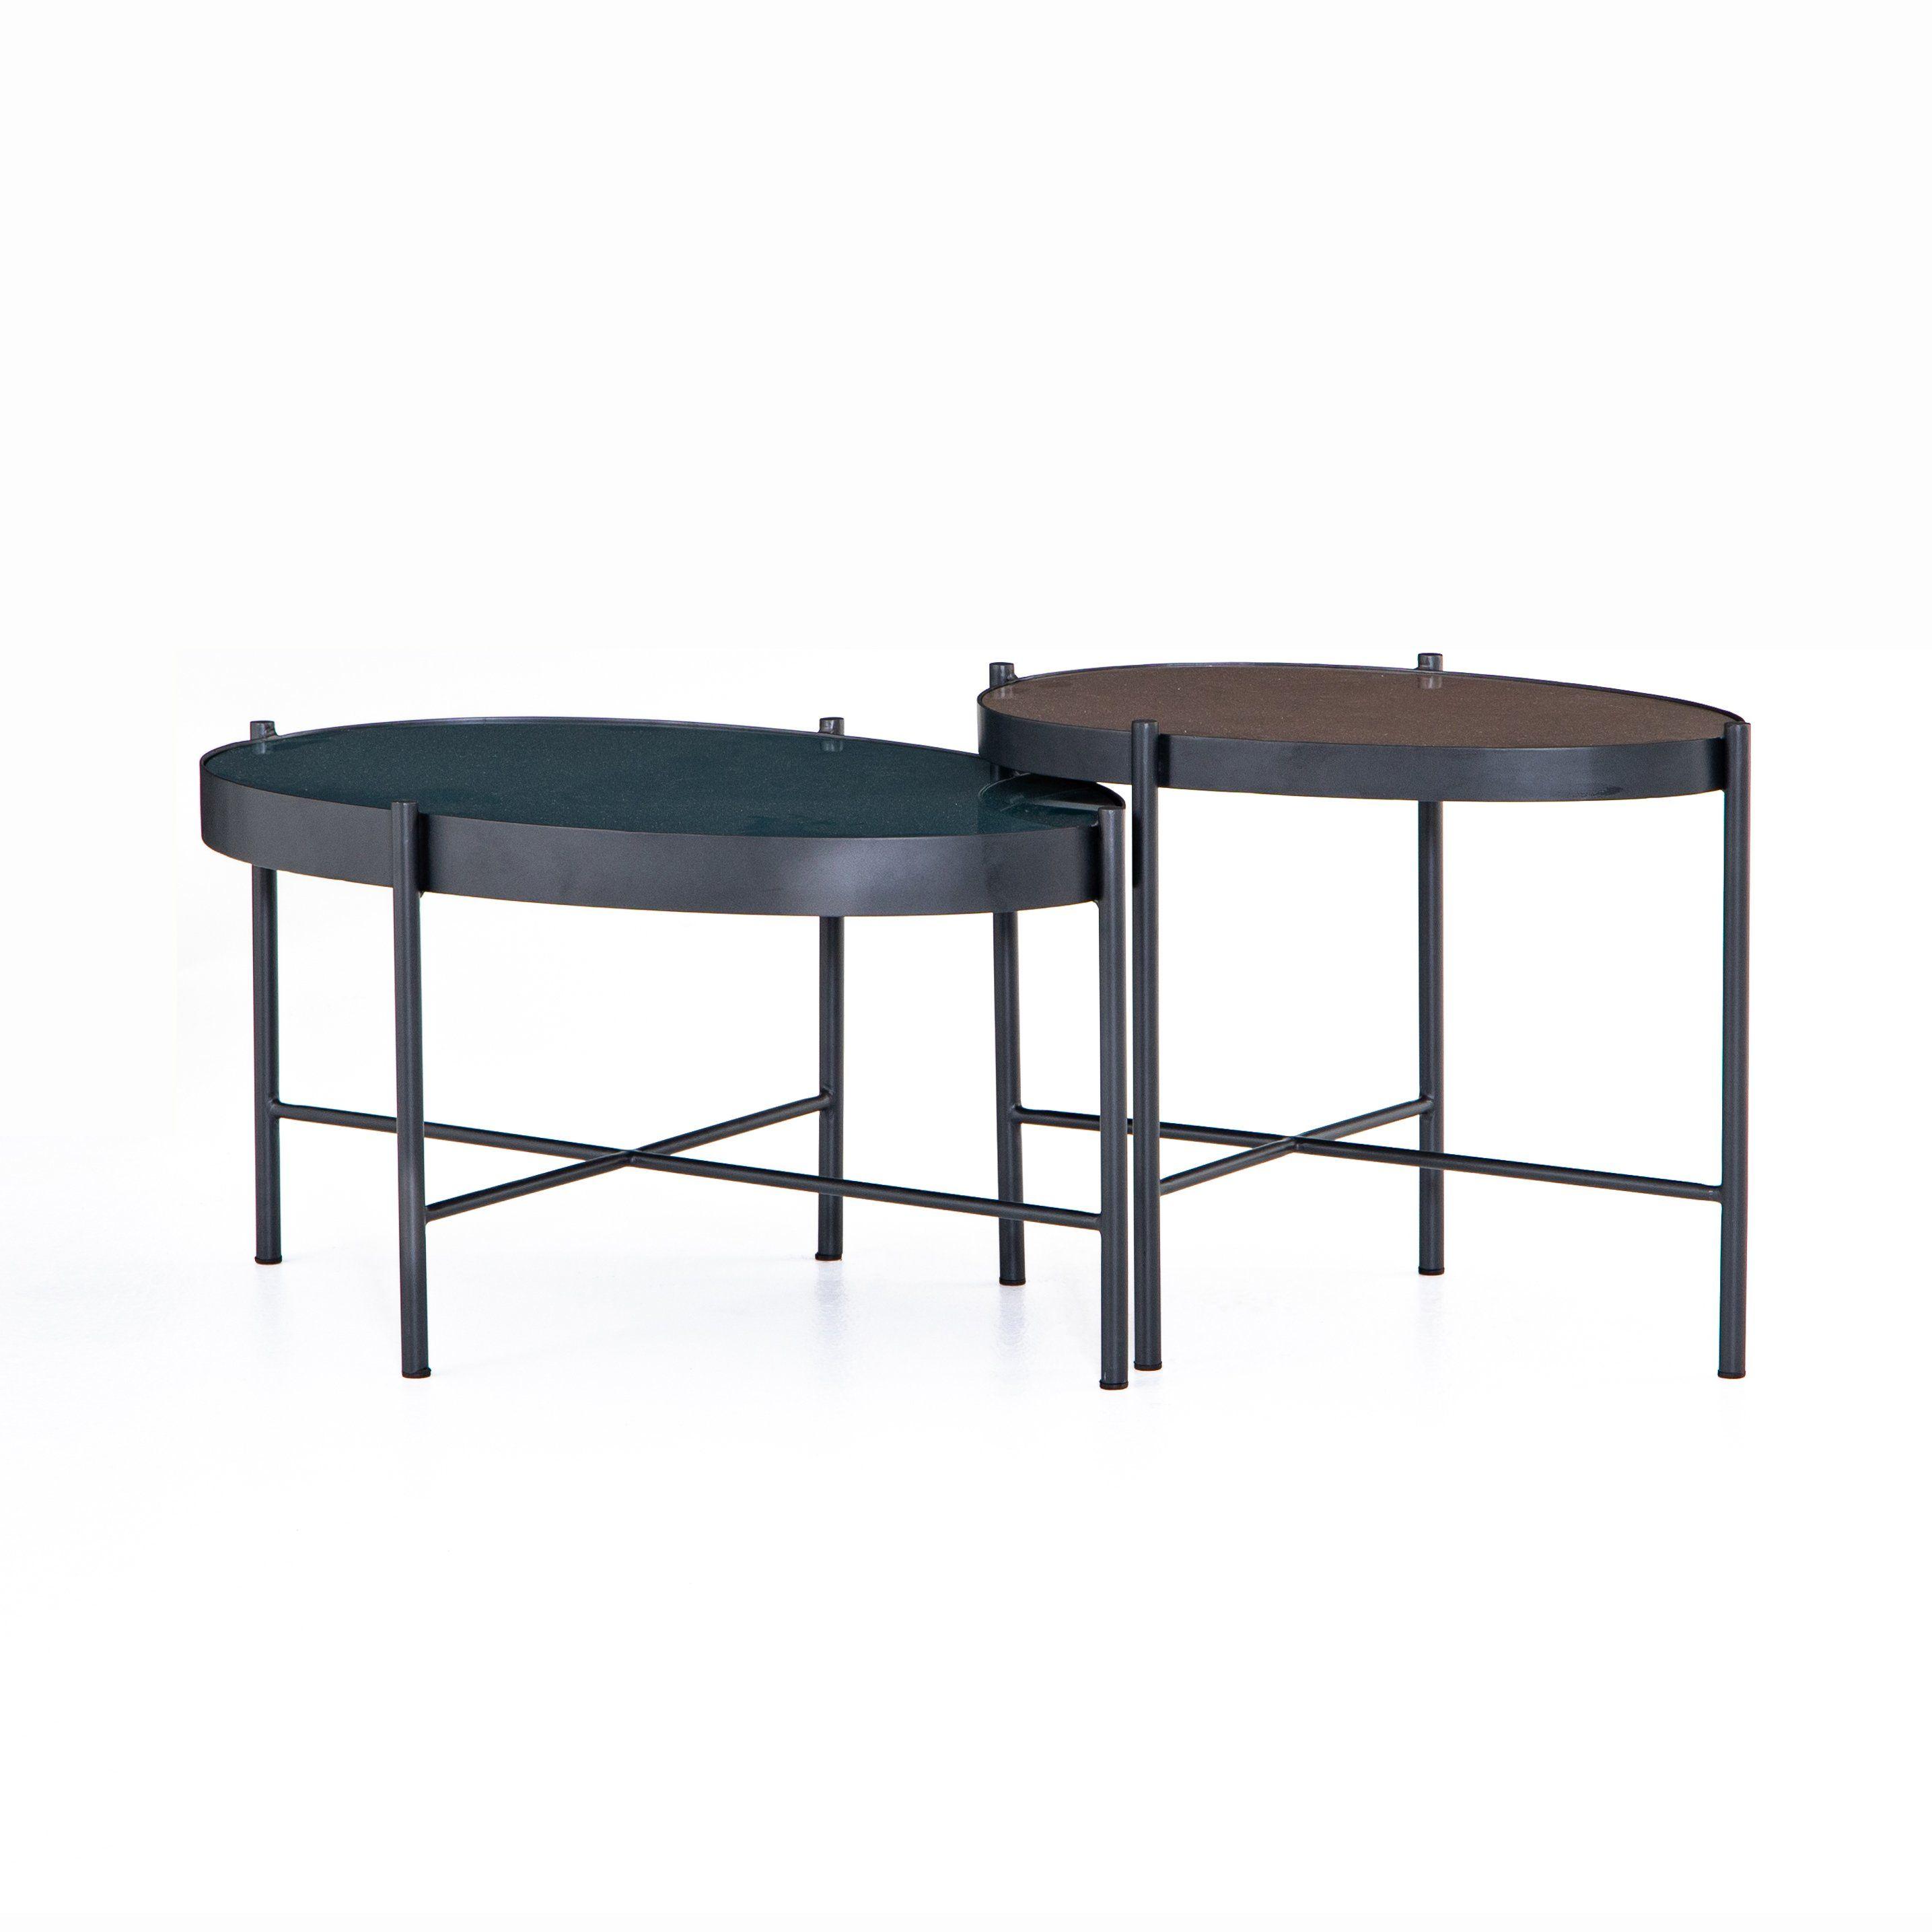 Payne Nesting Coffee Table Coffee Table Nesting Coffee Tables Contemporary Coffee Table [ 2871 x 2871 Pixel ]